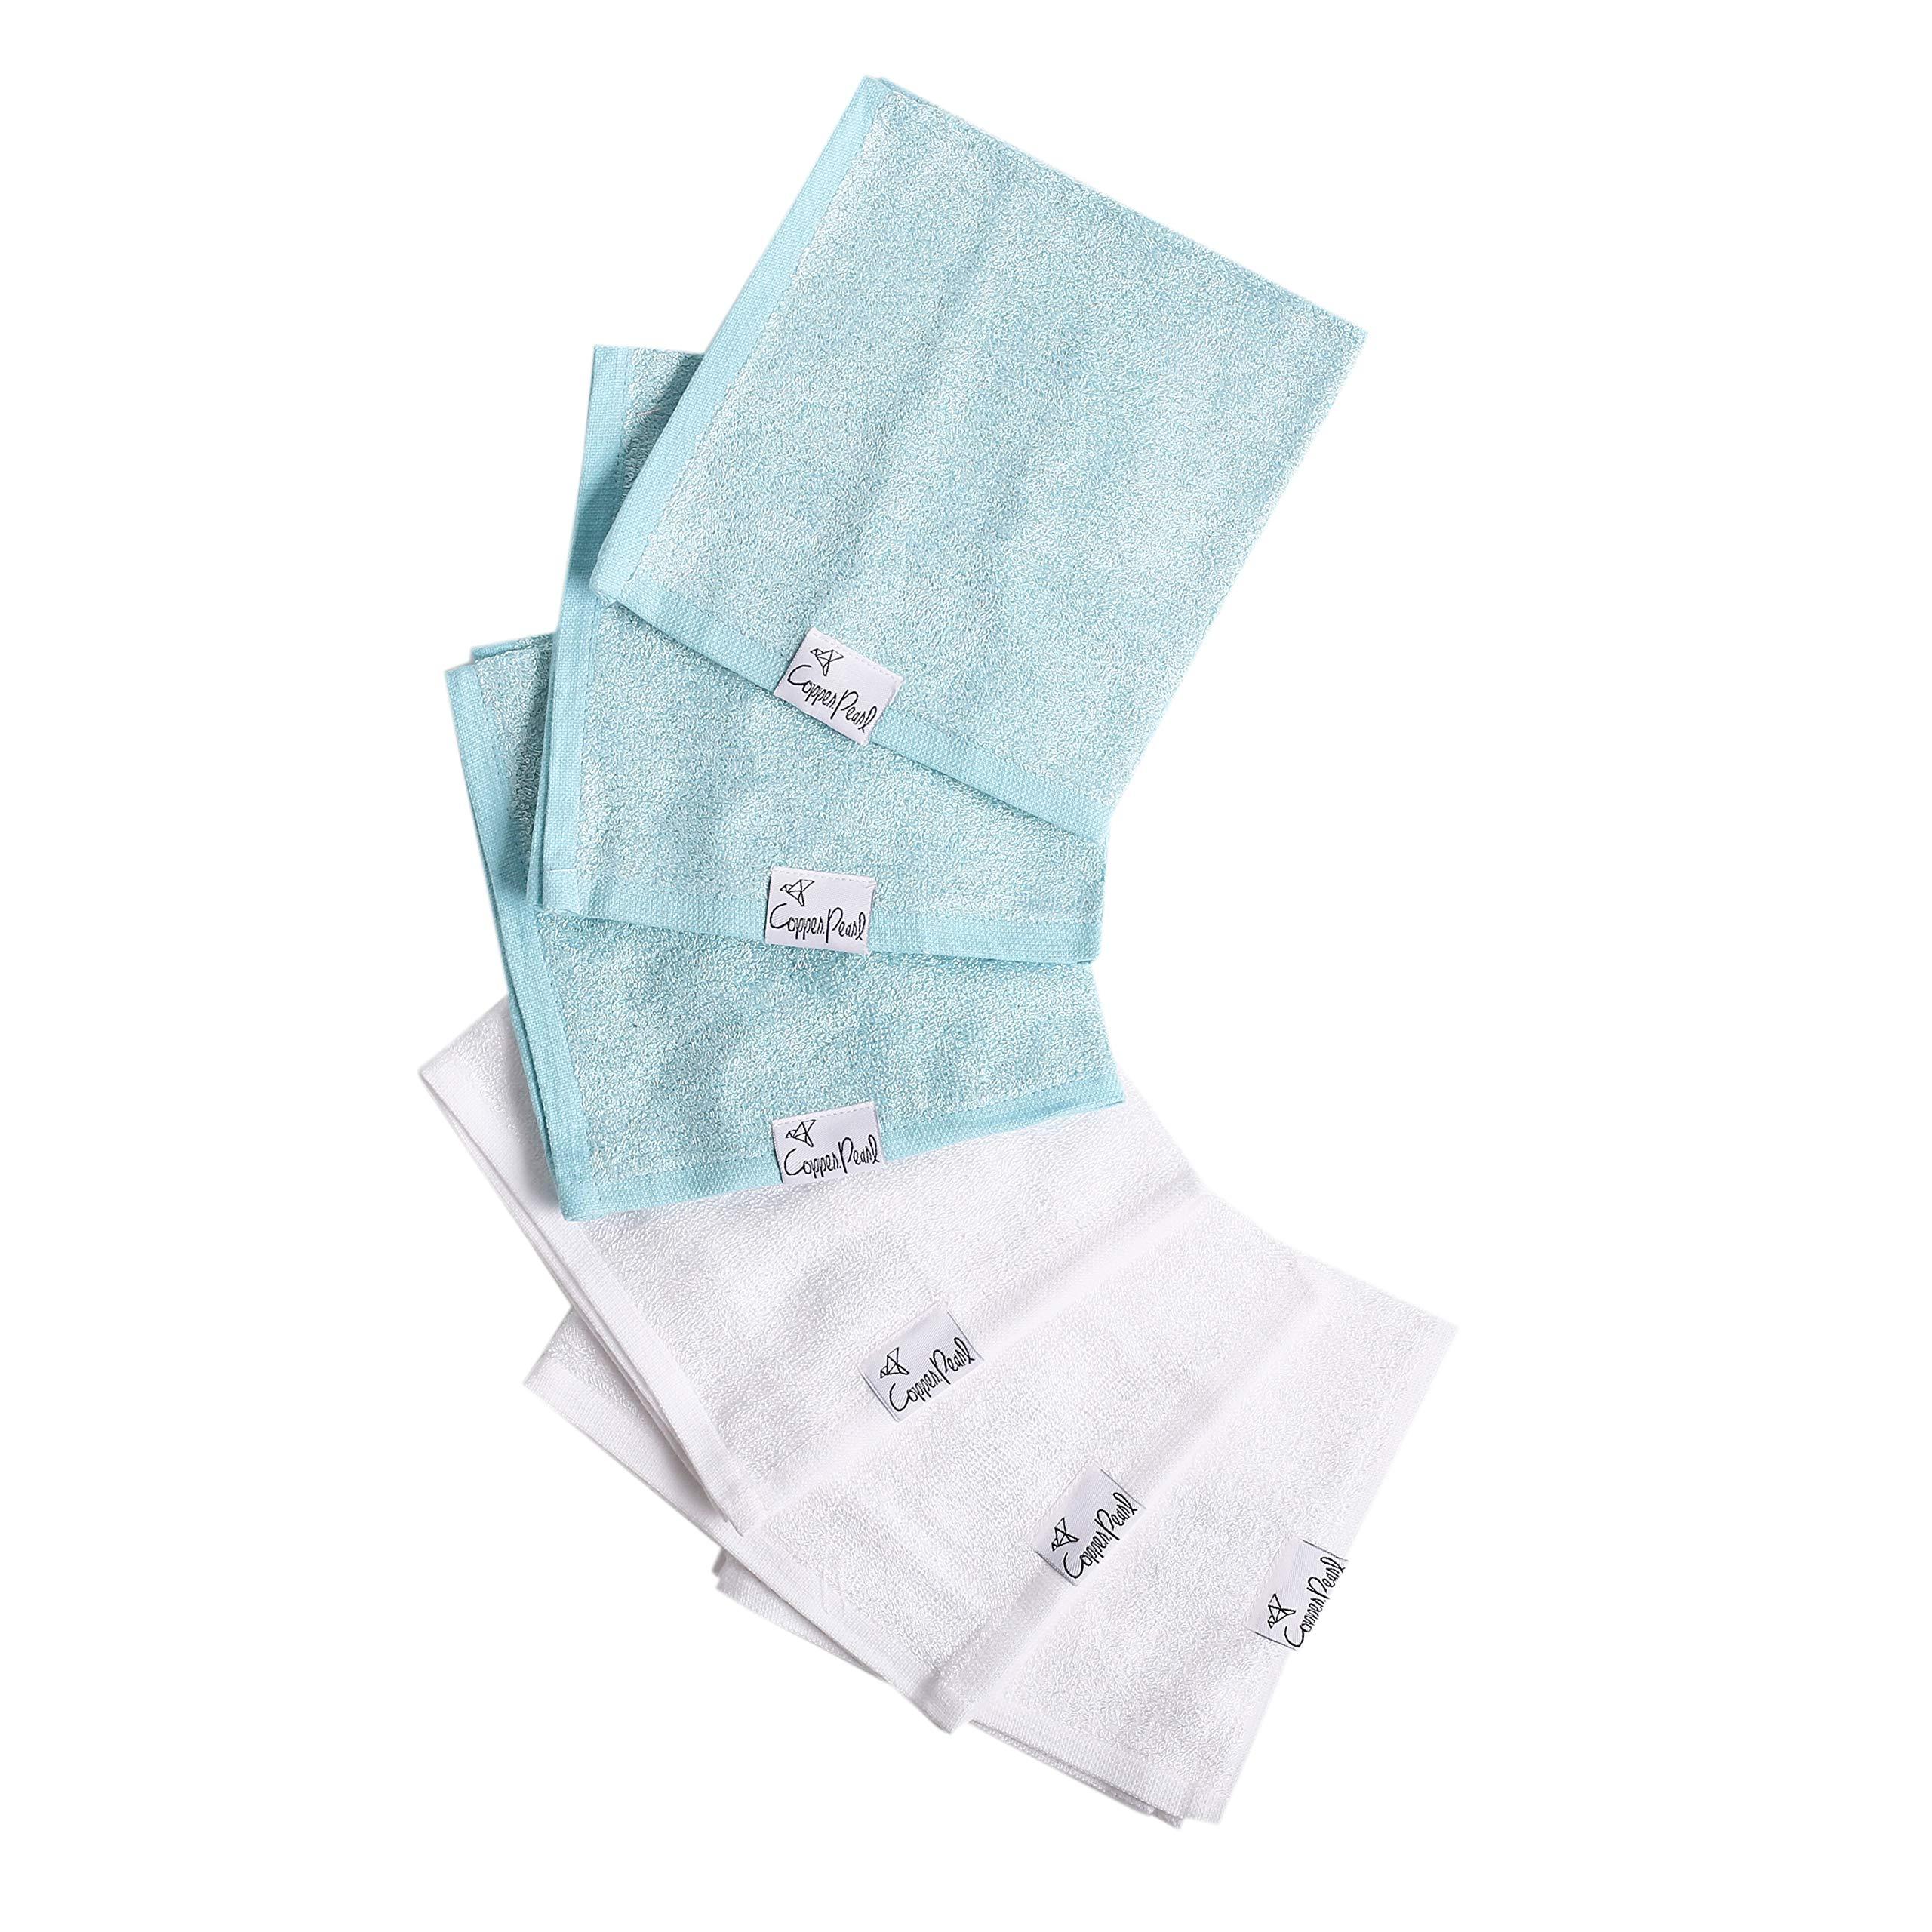 6 Ultra Soft Baby Bath Washcloths Premium Large